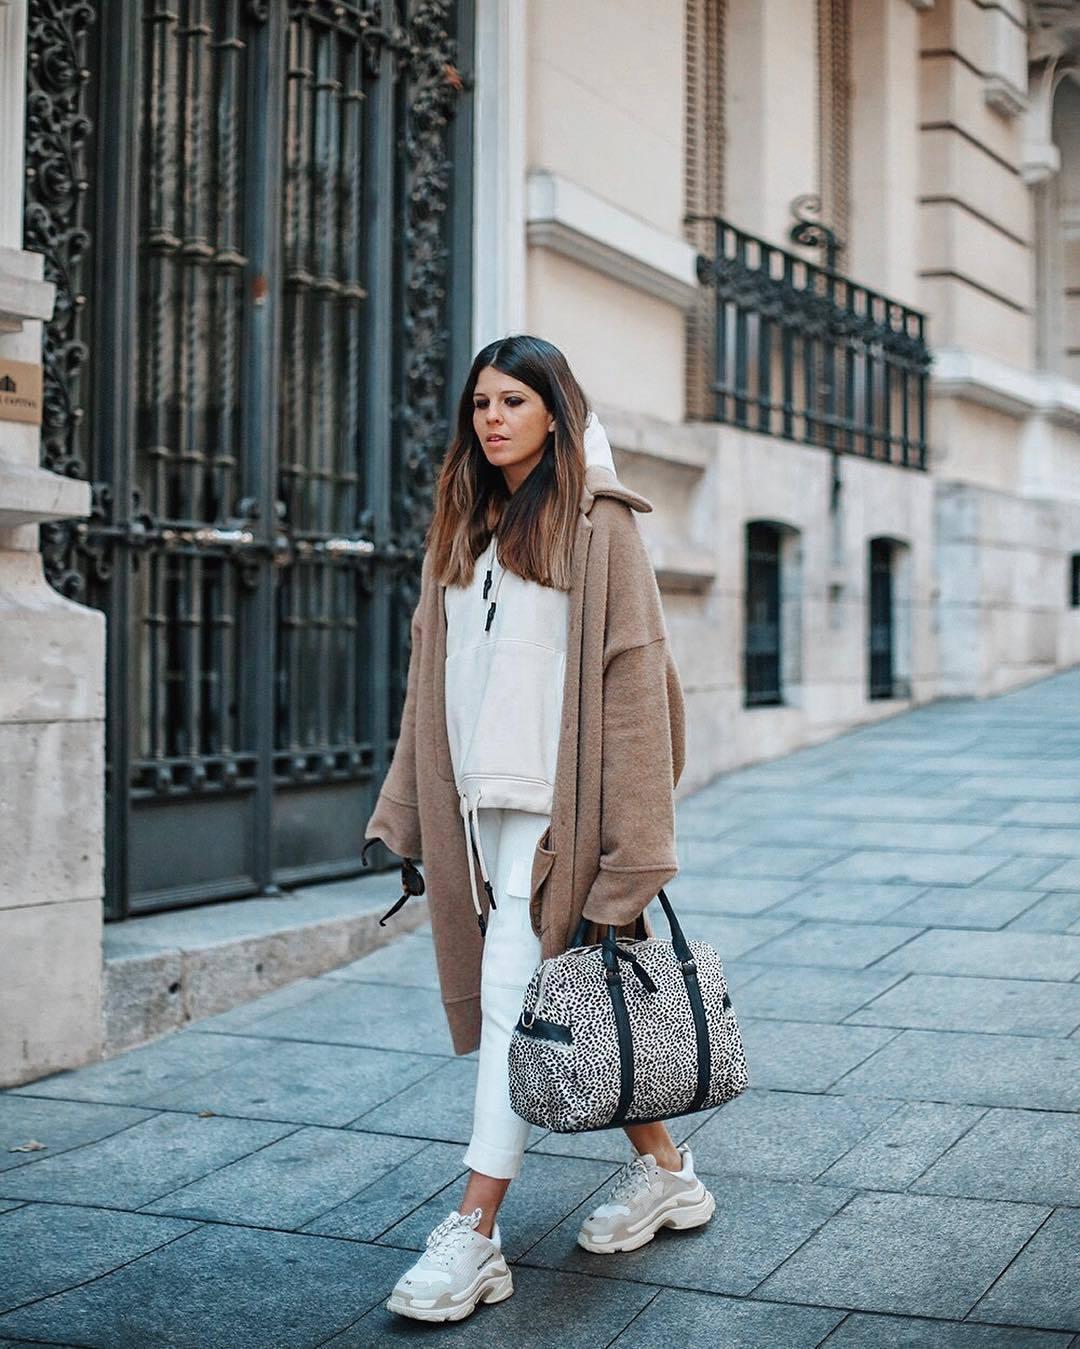 bag polka dots white sneakers balenciaga white pants capri pants beige coat celine white hoodie